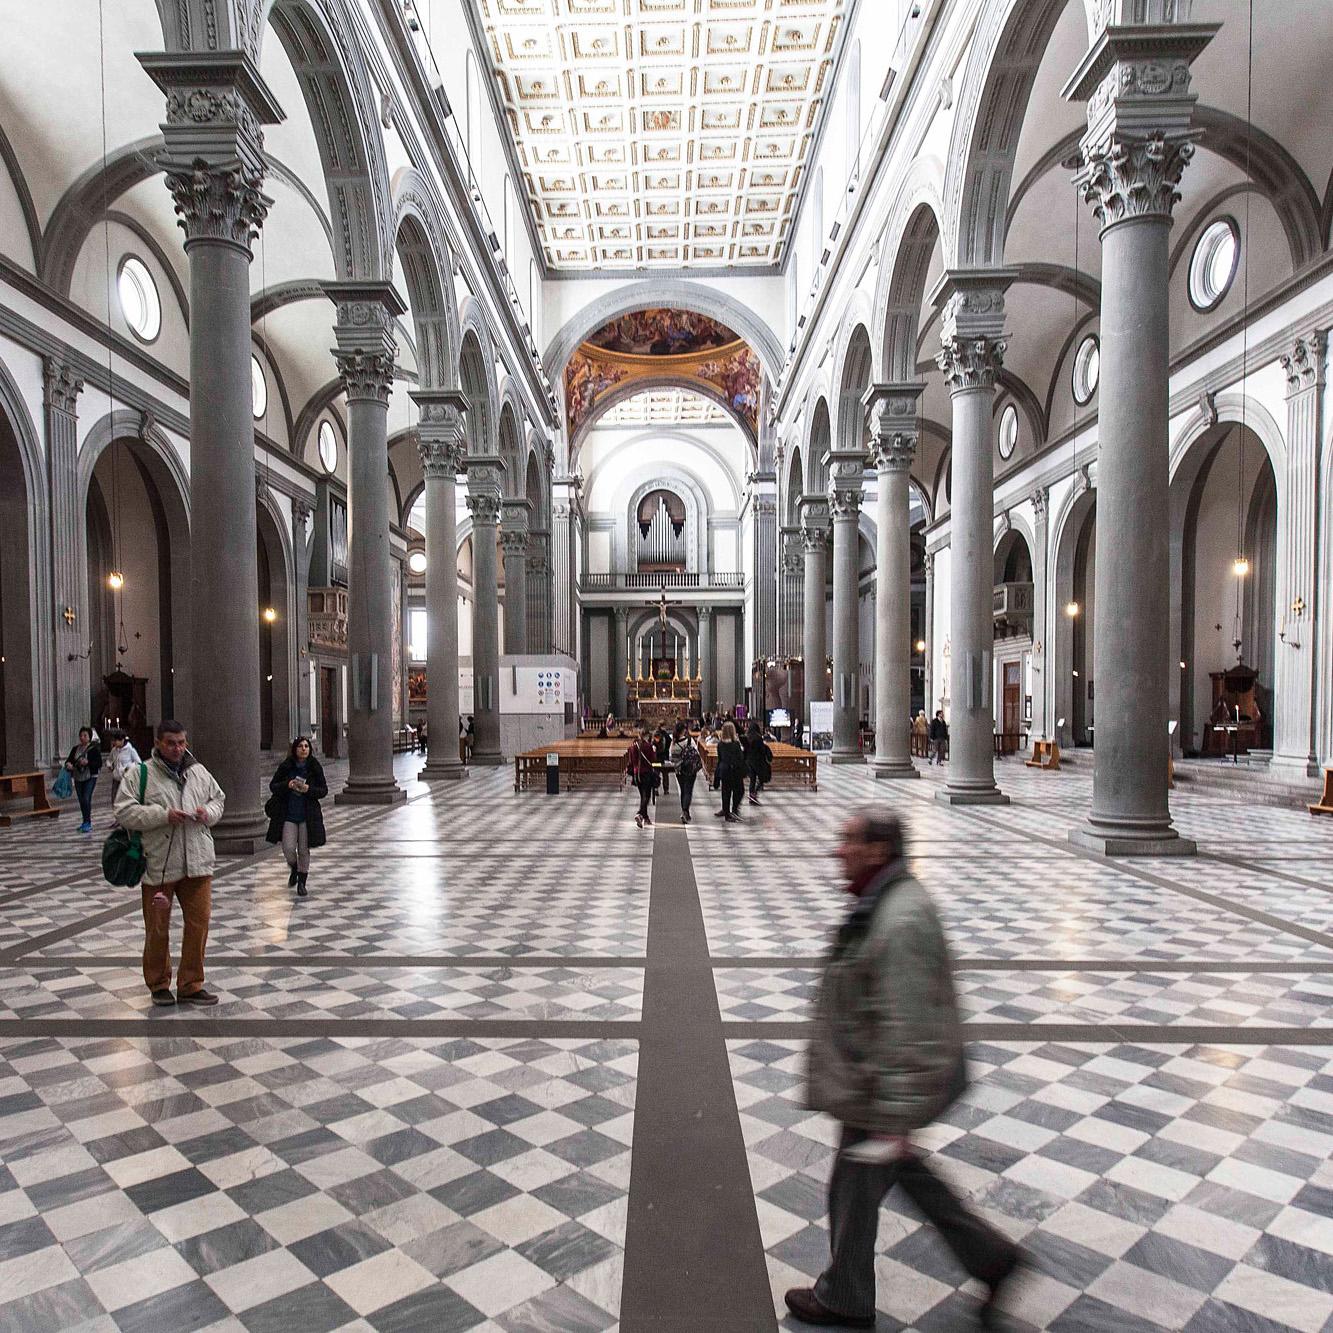 cappelle-medicee-basilica-san-lorenzo_3_firenze-yes-please.jpg